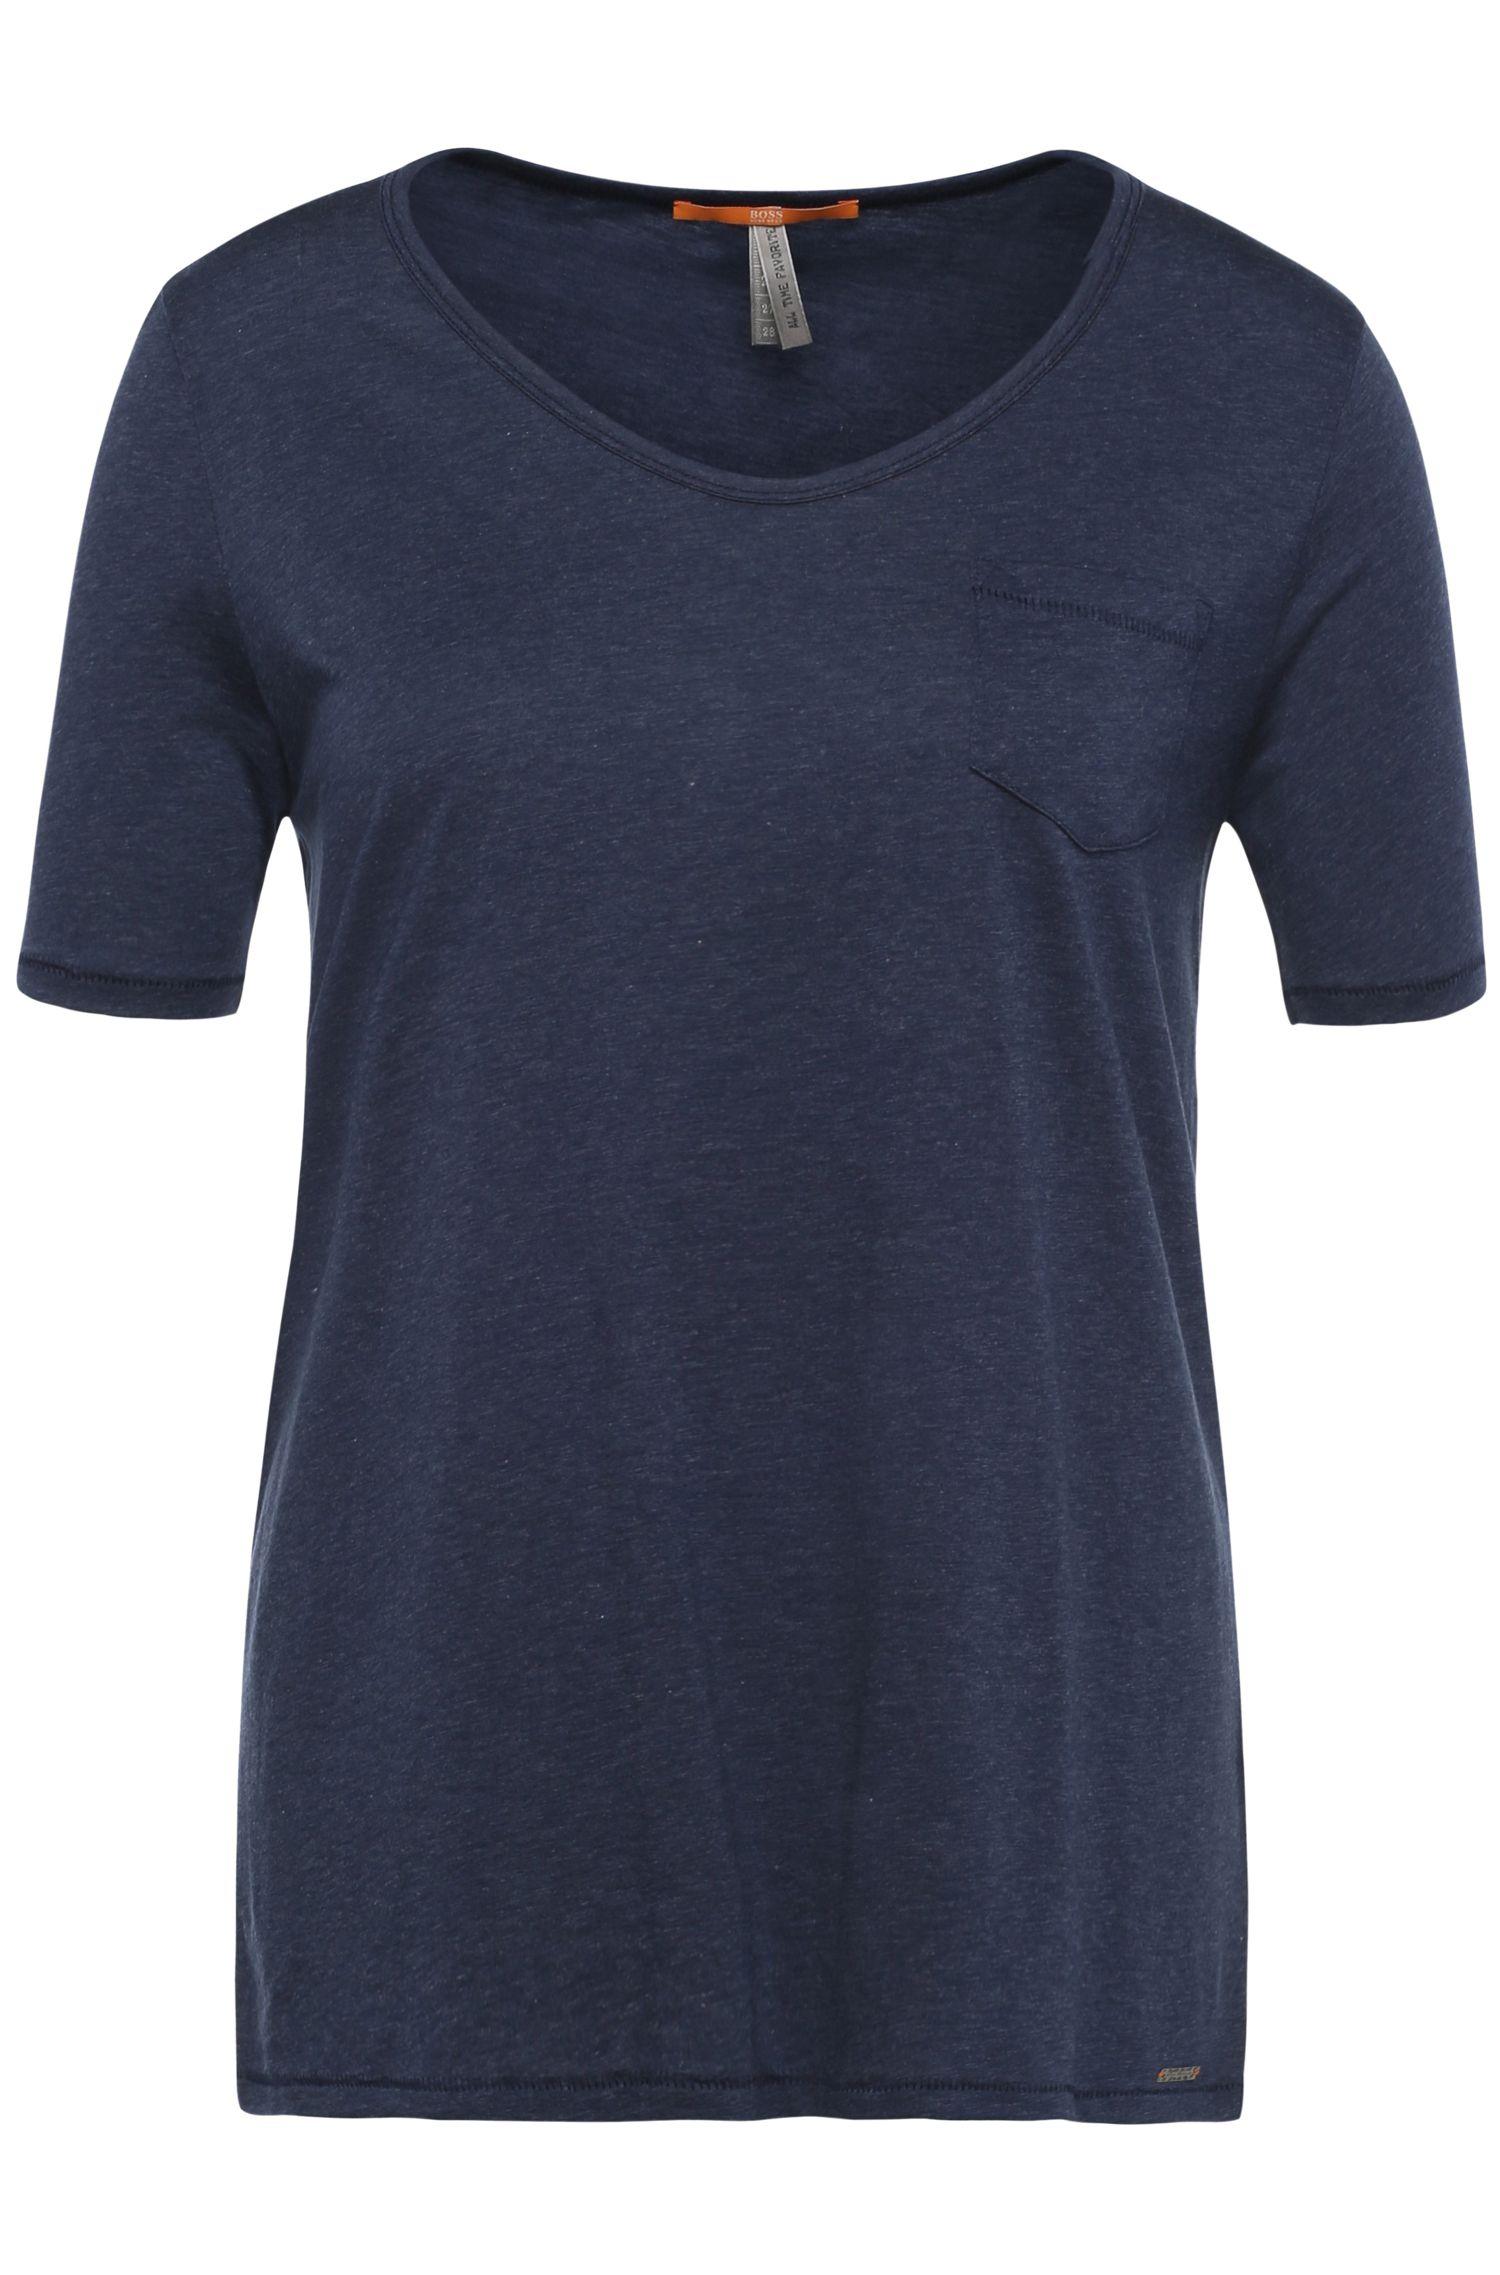 Regular-fit t-shirt in fabric blend with cotton: 'Tafavorite', Dark Blue